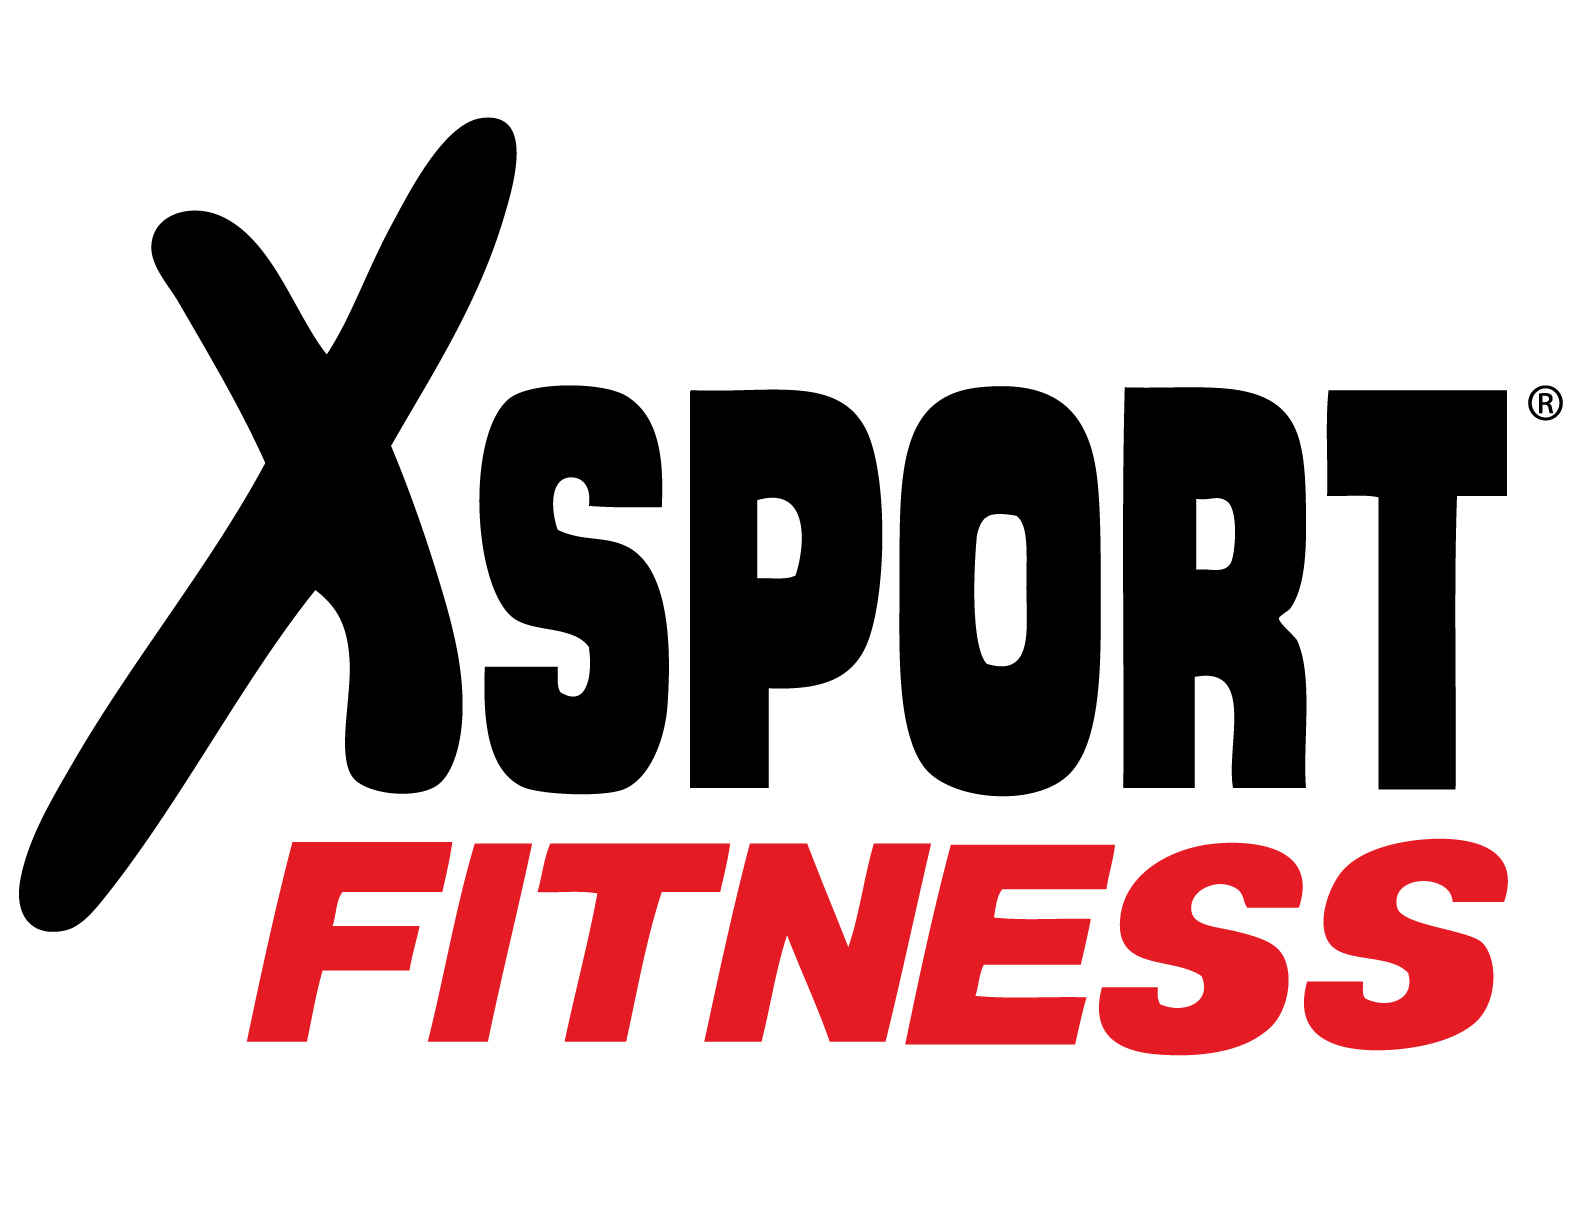 XSport Fitness - Logo